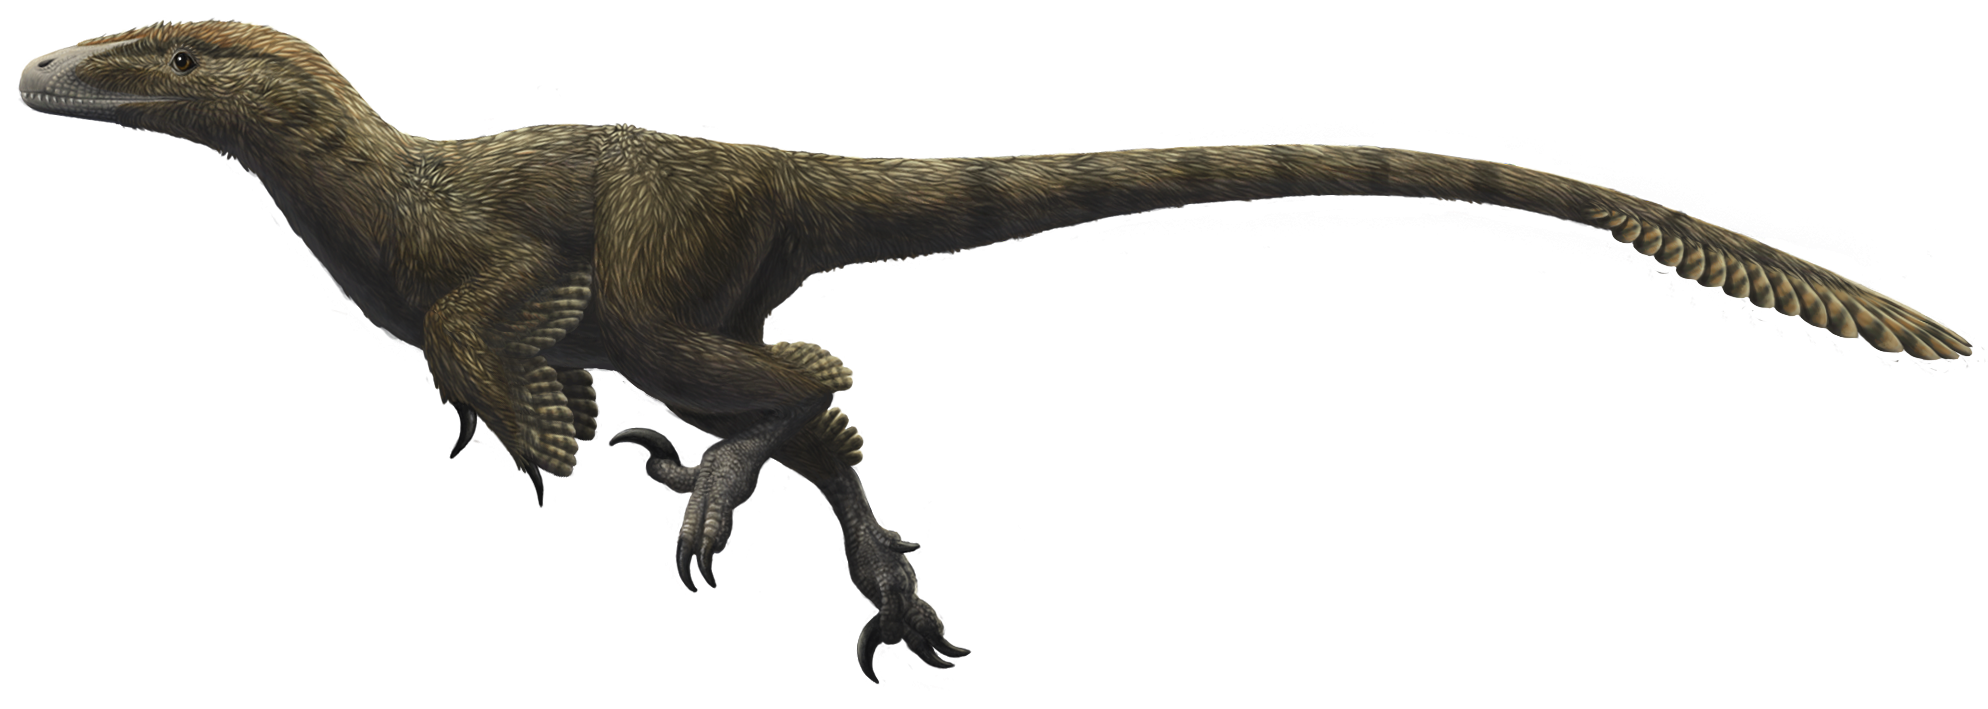 File:Utahraptor ostrommaysorum.png - Wikimedia Commons